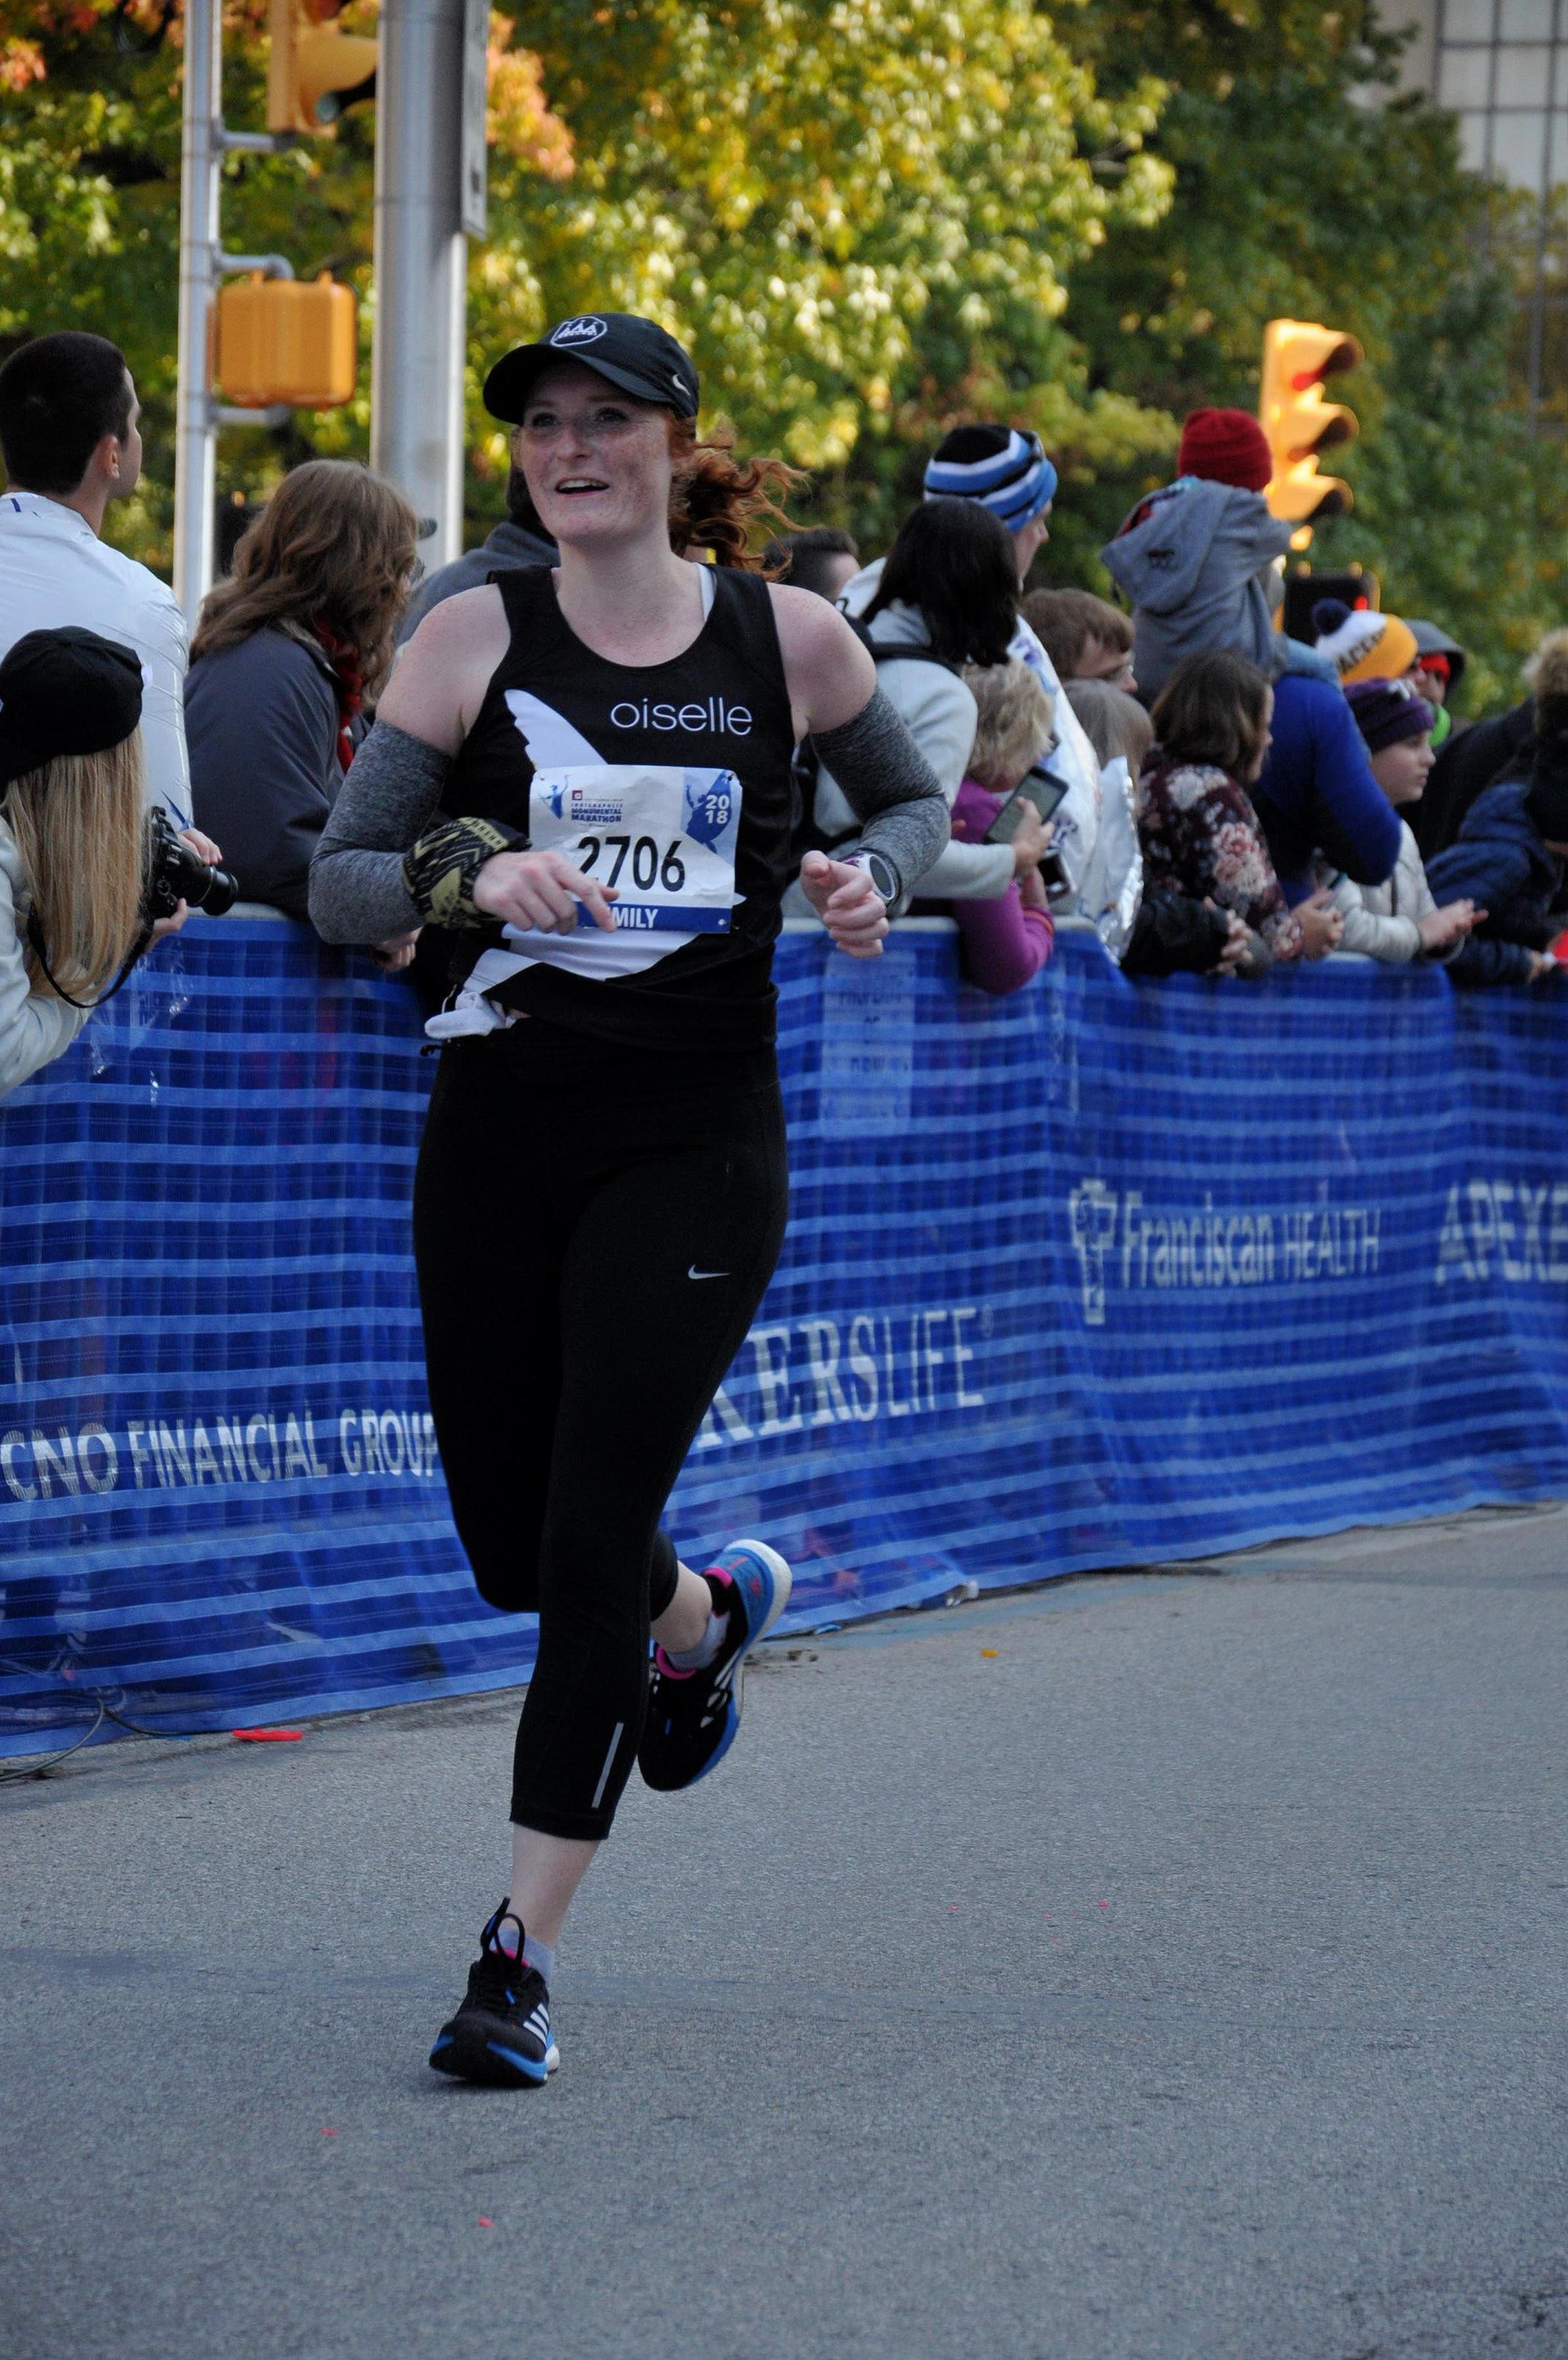 breaking 4 in the marathon.jpg